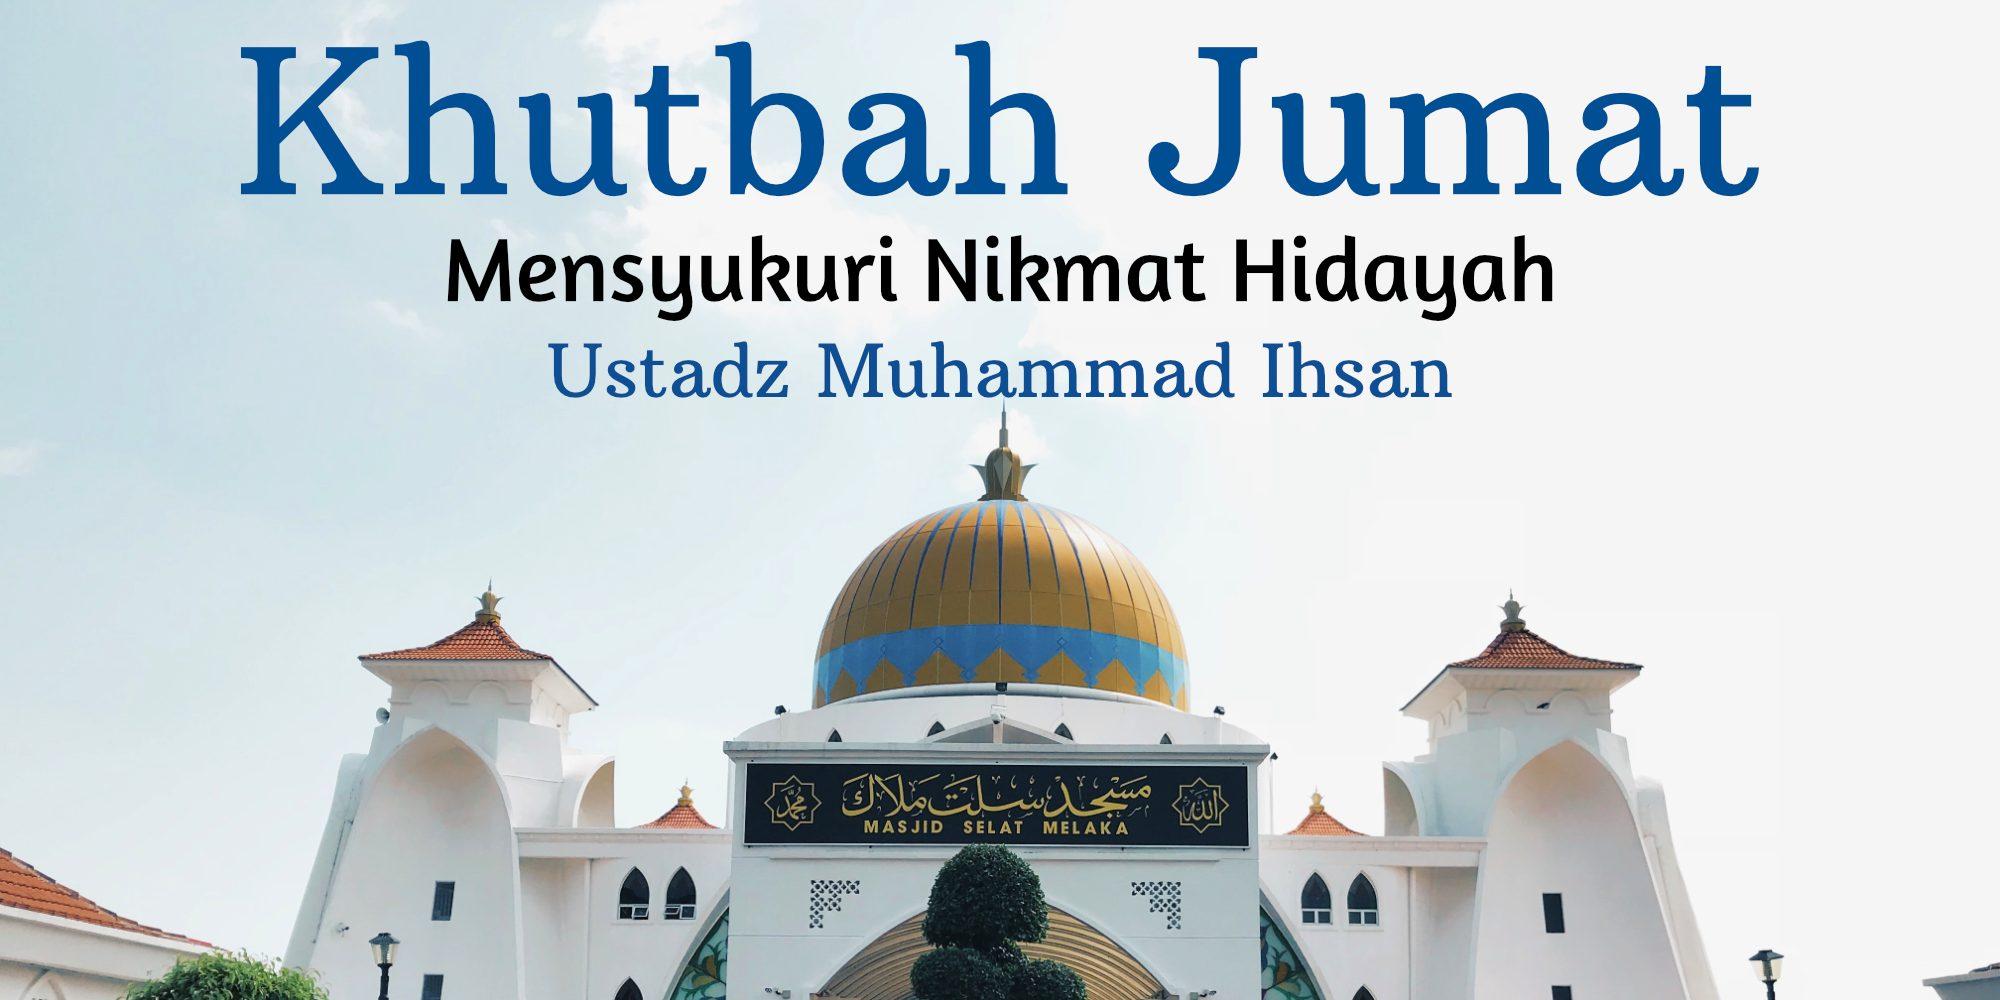 Khutbah jum'at Mensyukuri Nikmat Hidayah